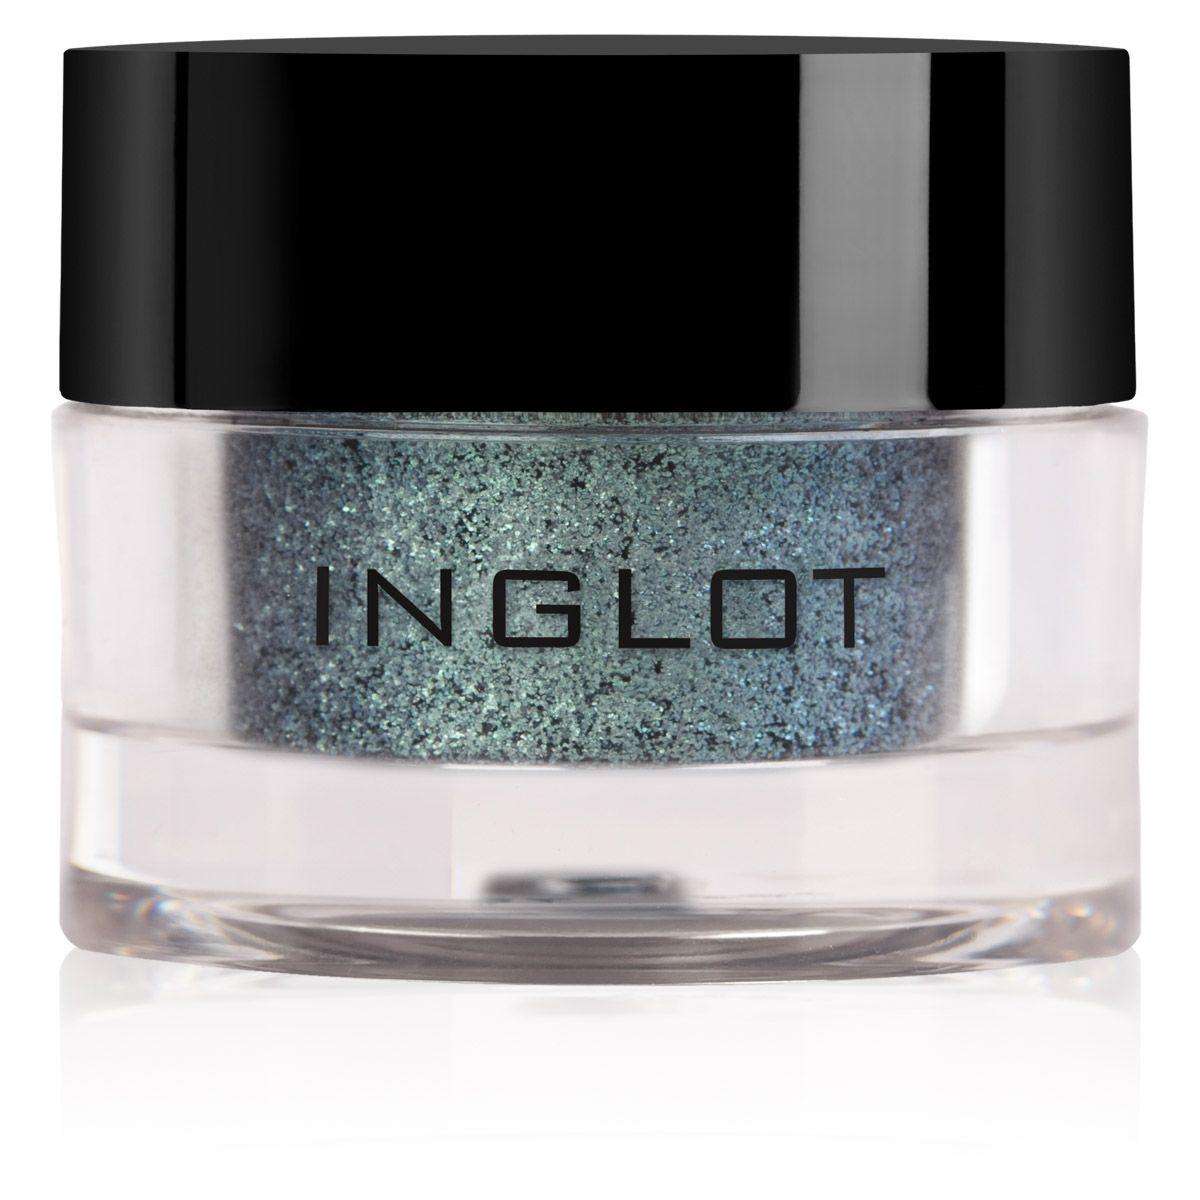 Inglot AMC Pure Pigment Eye Shadow - 117